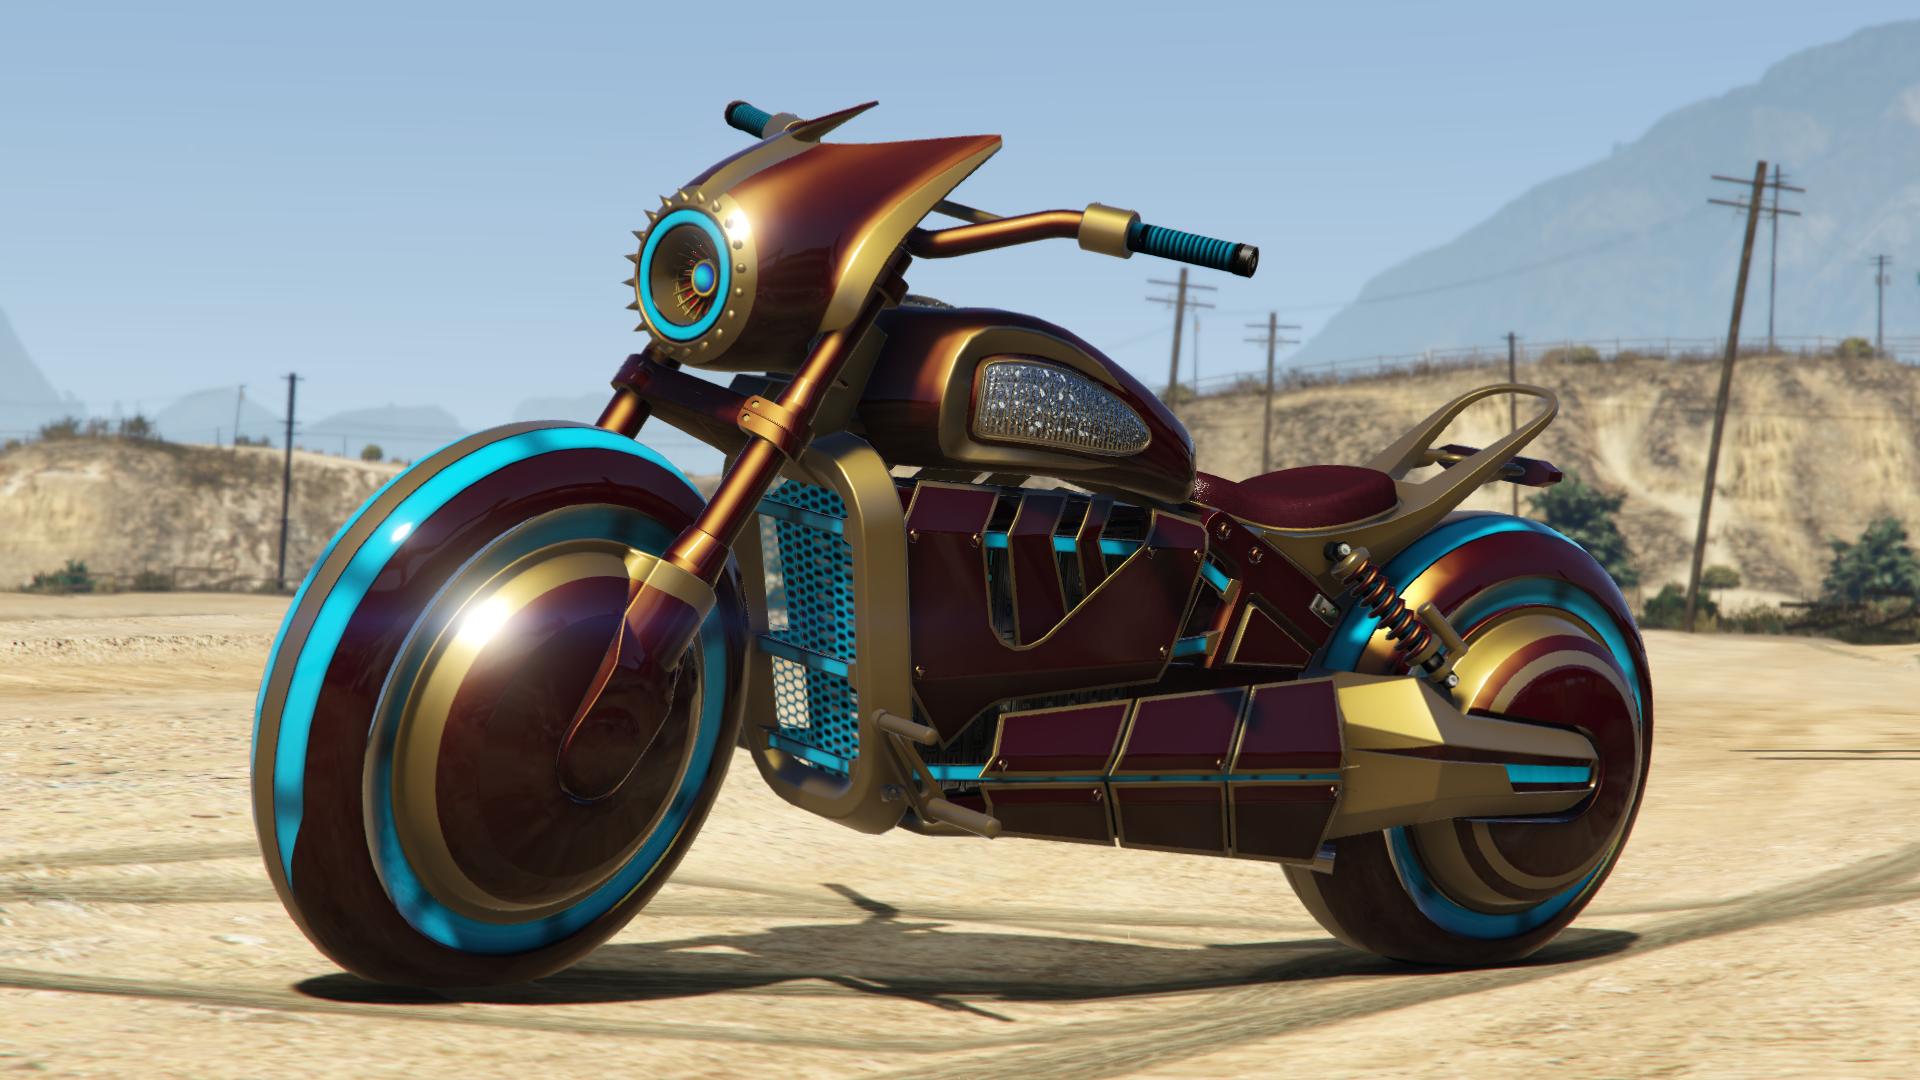 deathbike gta 5